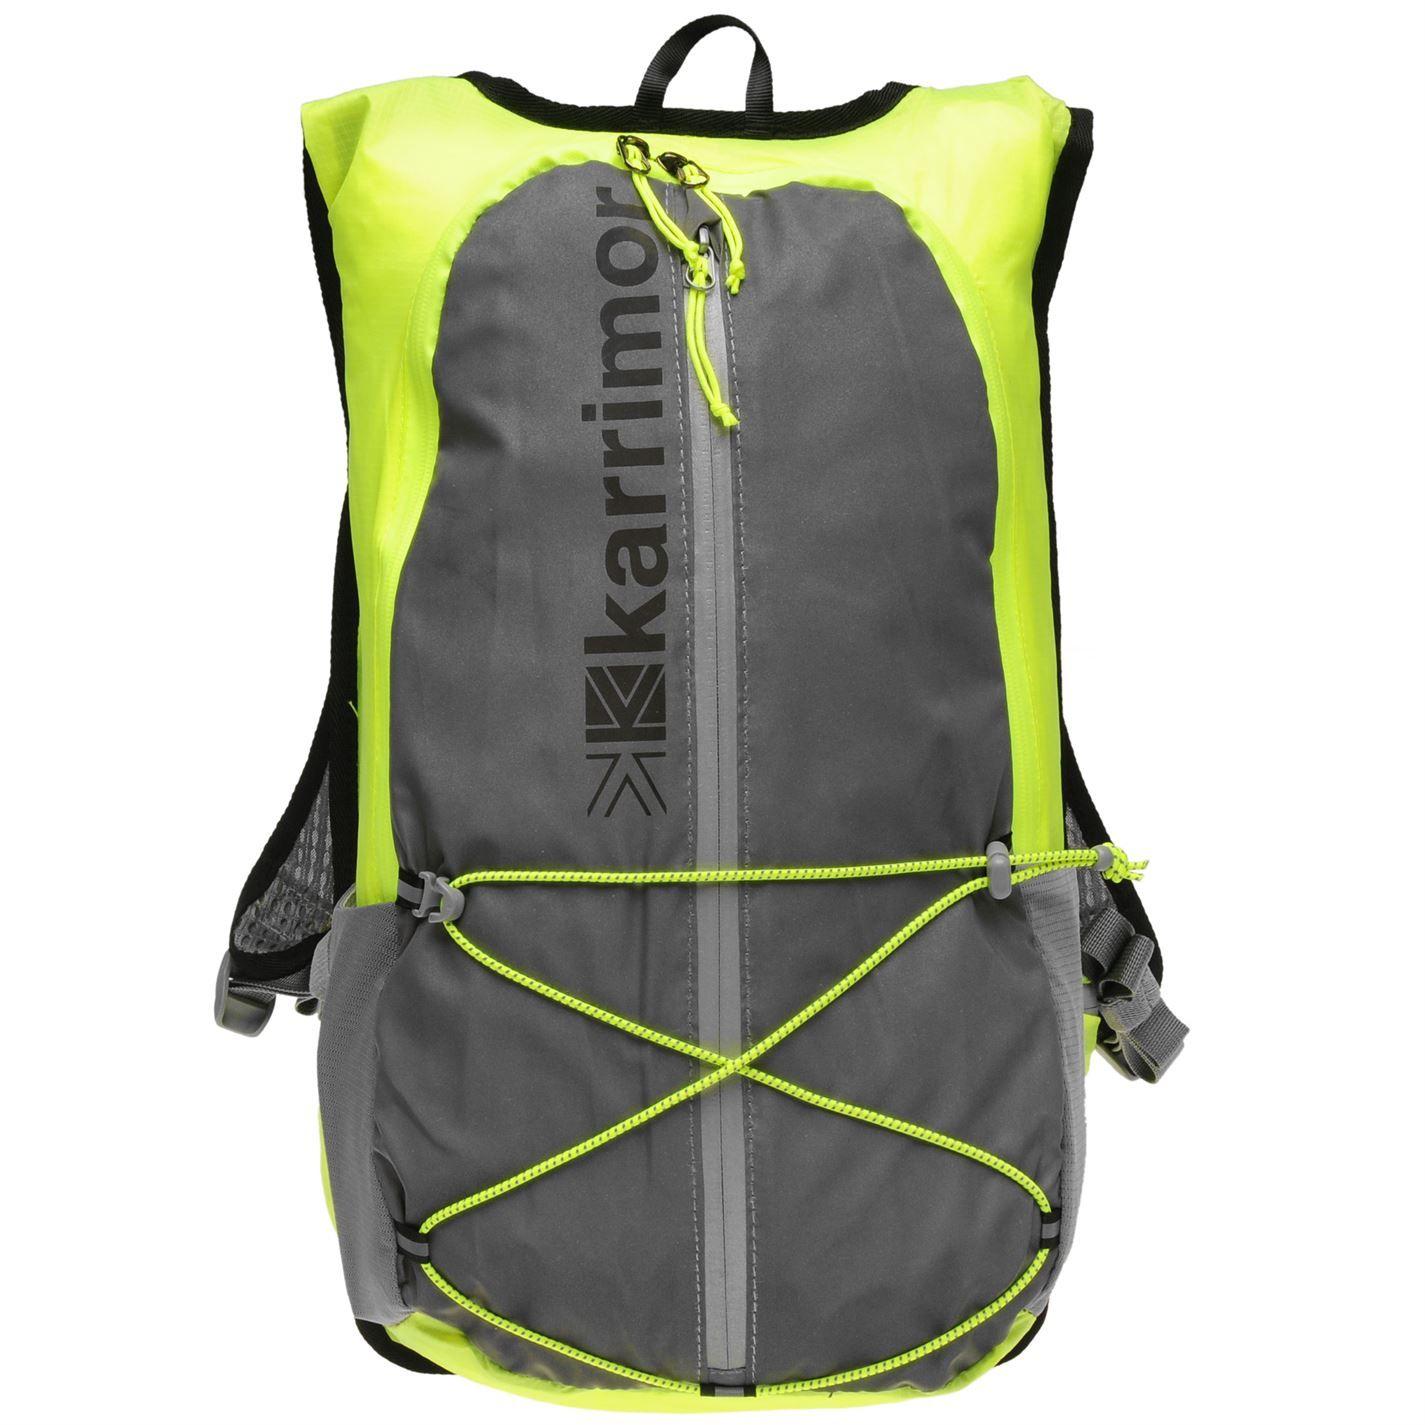 Karrimor X Lite 15L Running Back Pack Travel Luggage Everyday Casual Bag